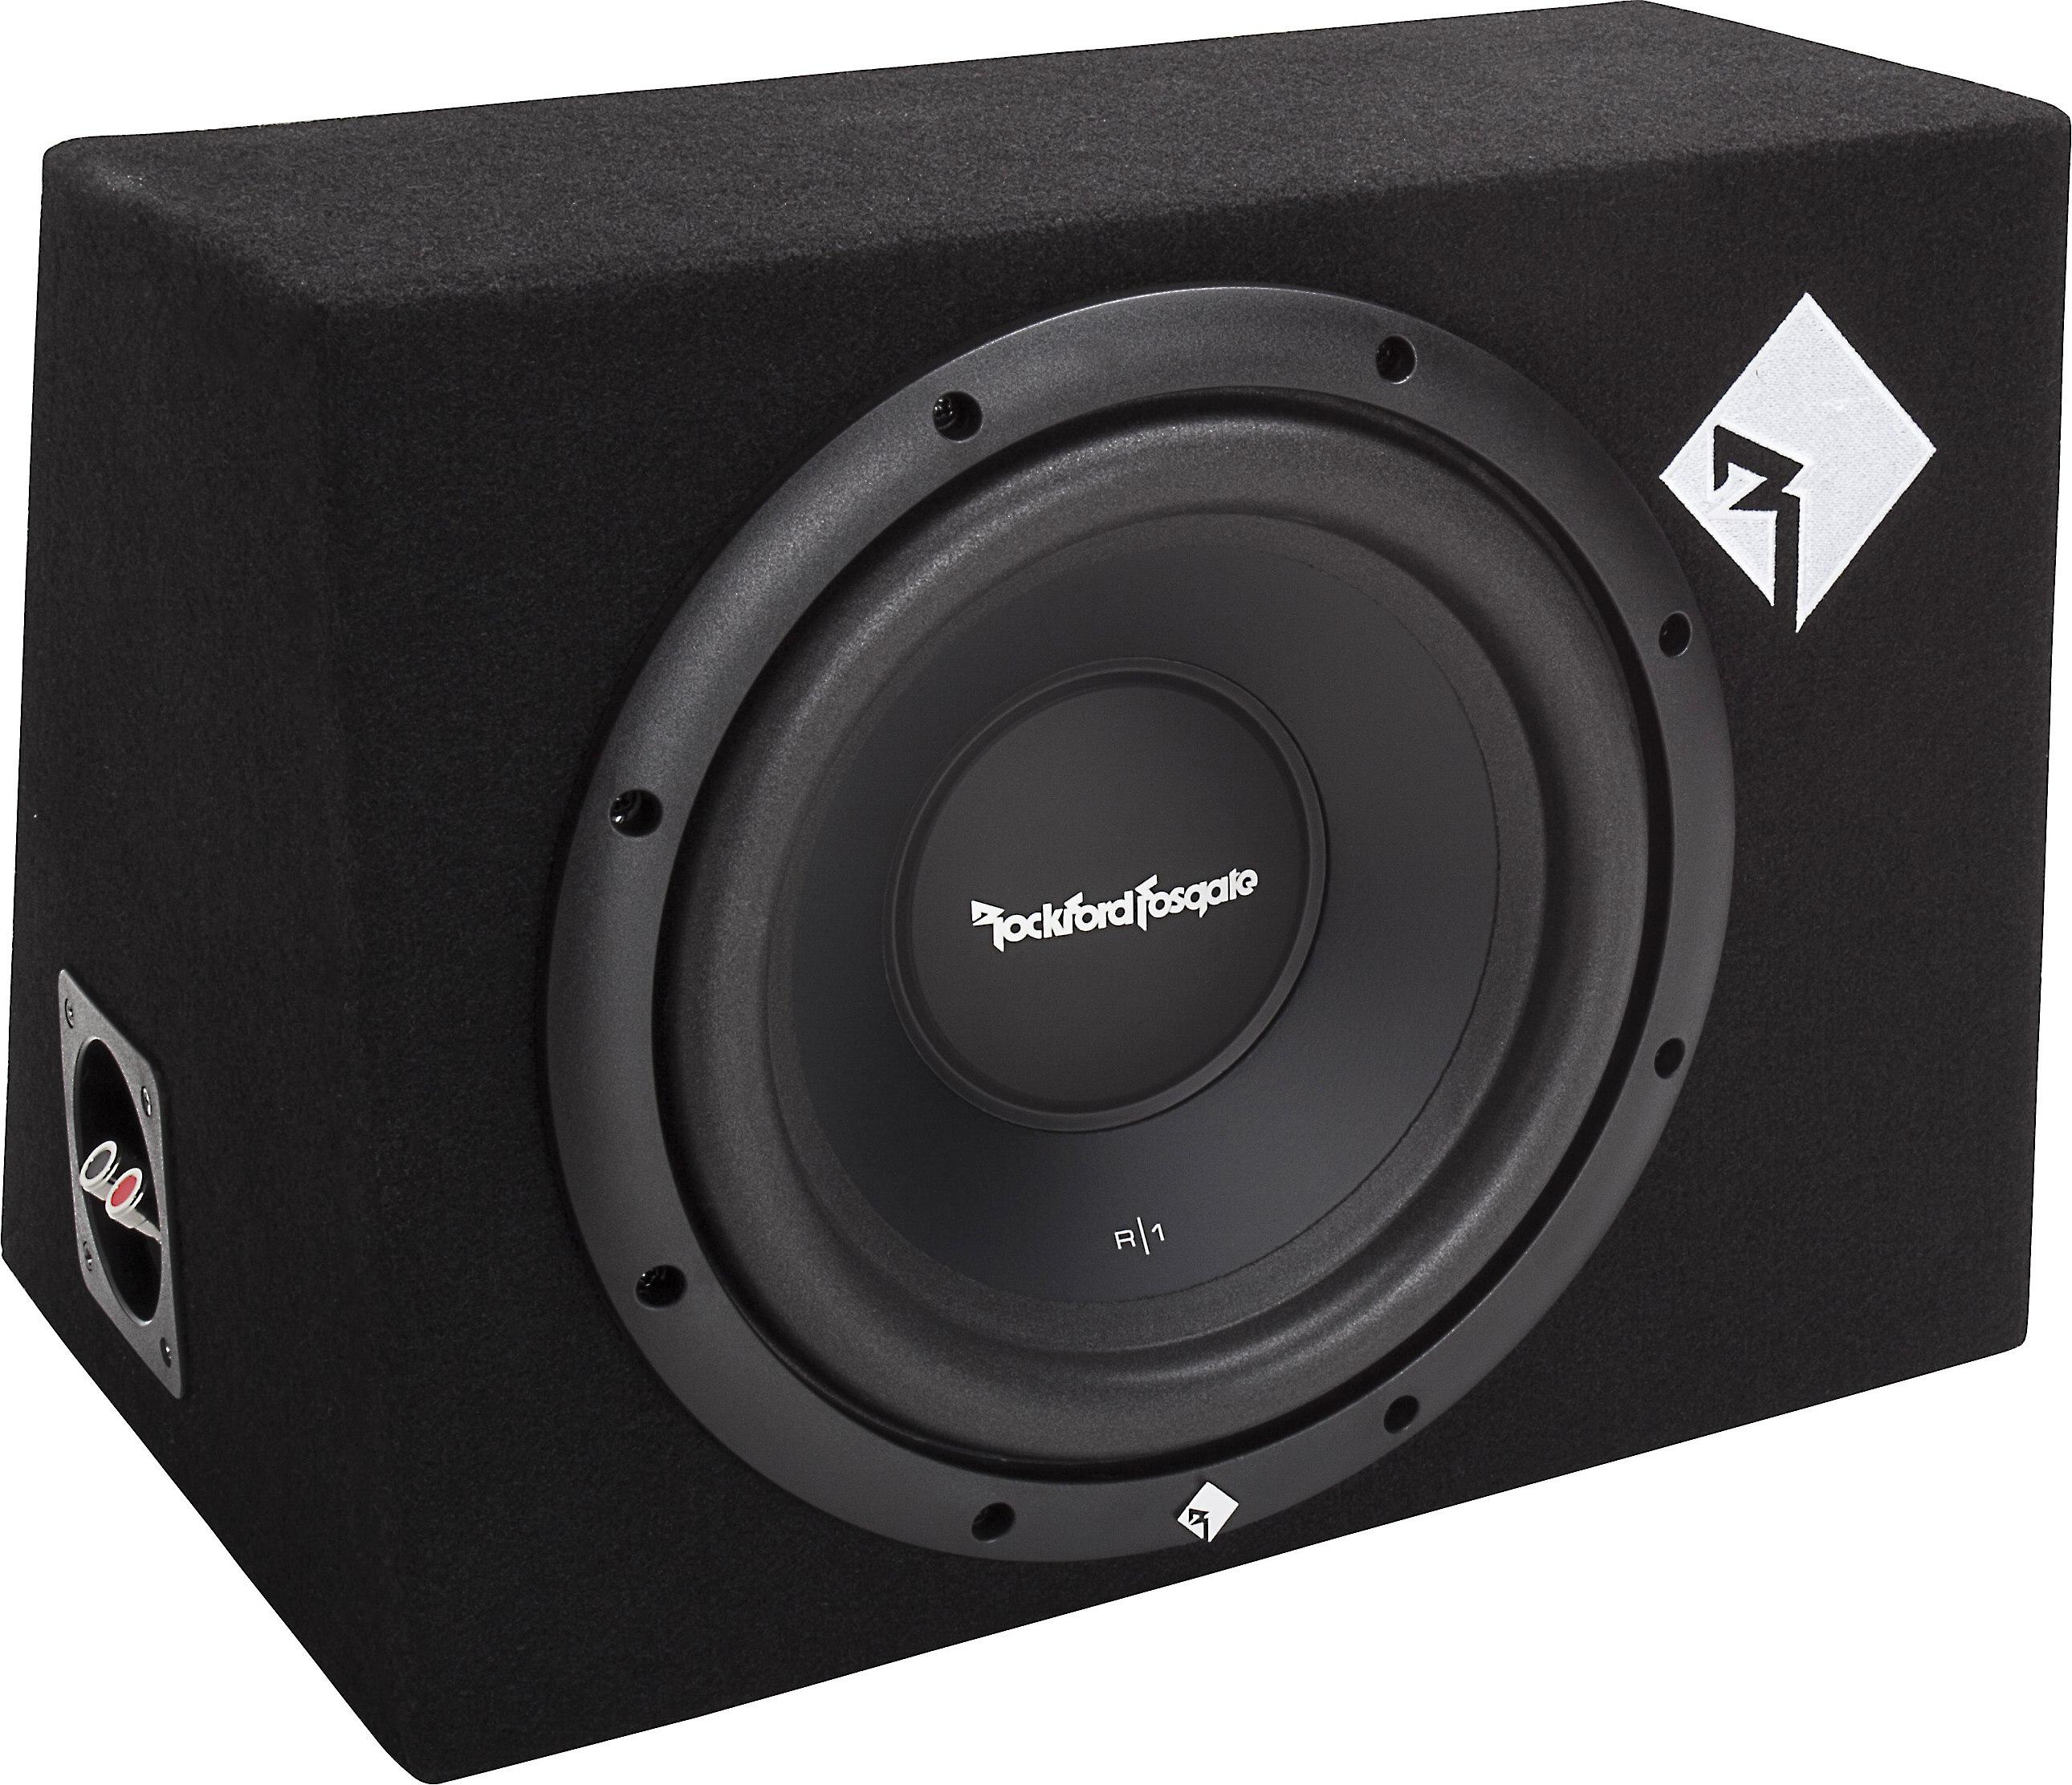 Rockford Fosgate Prime R1-1X10